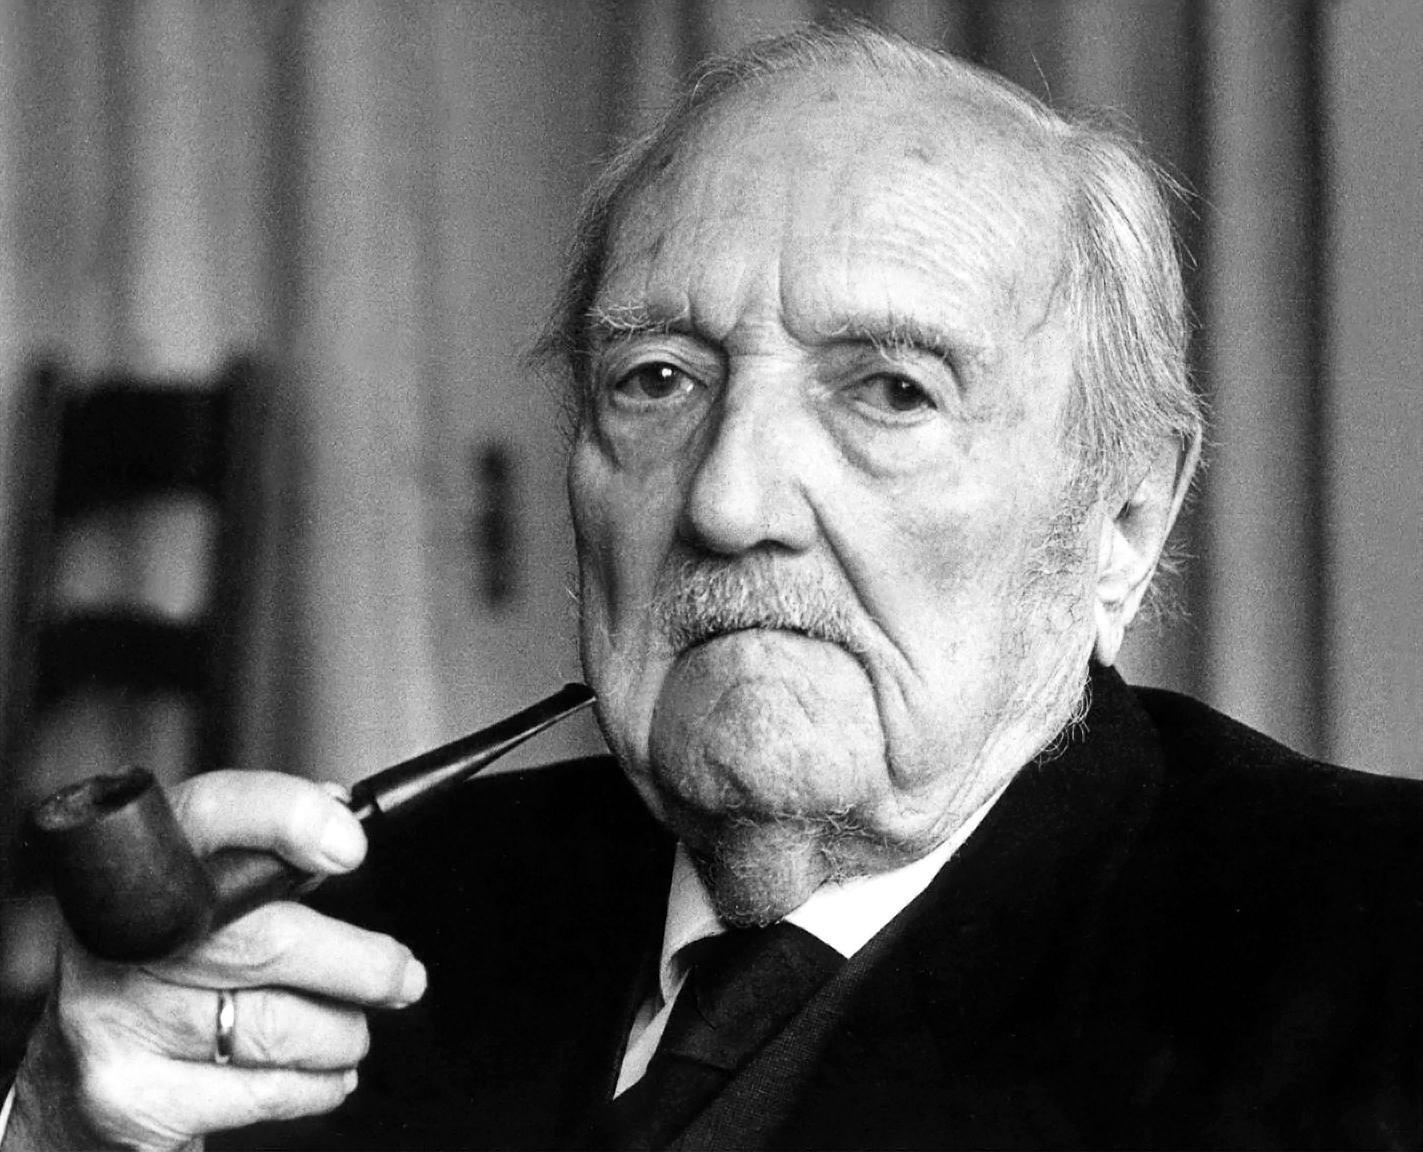 Bultmann, Rudolf (1884-1976)